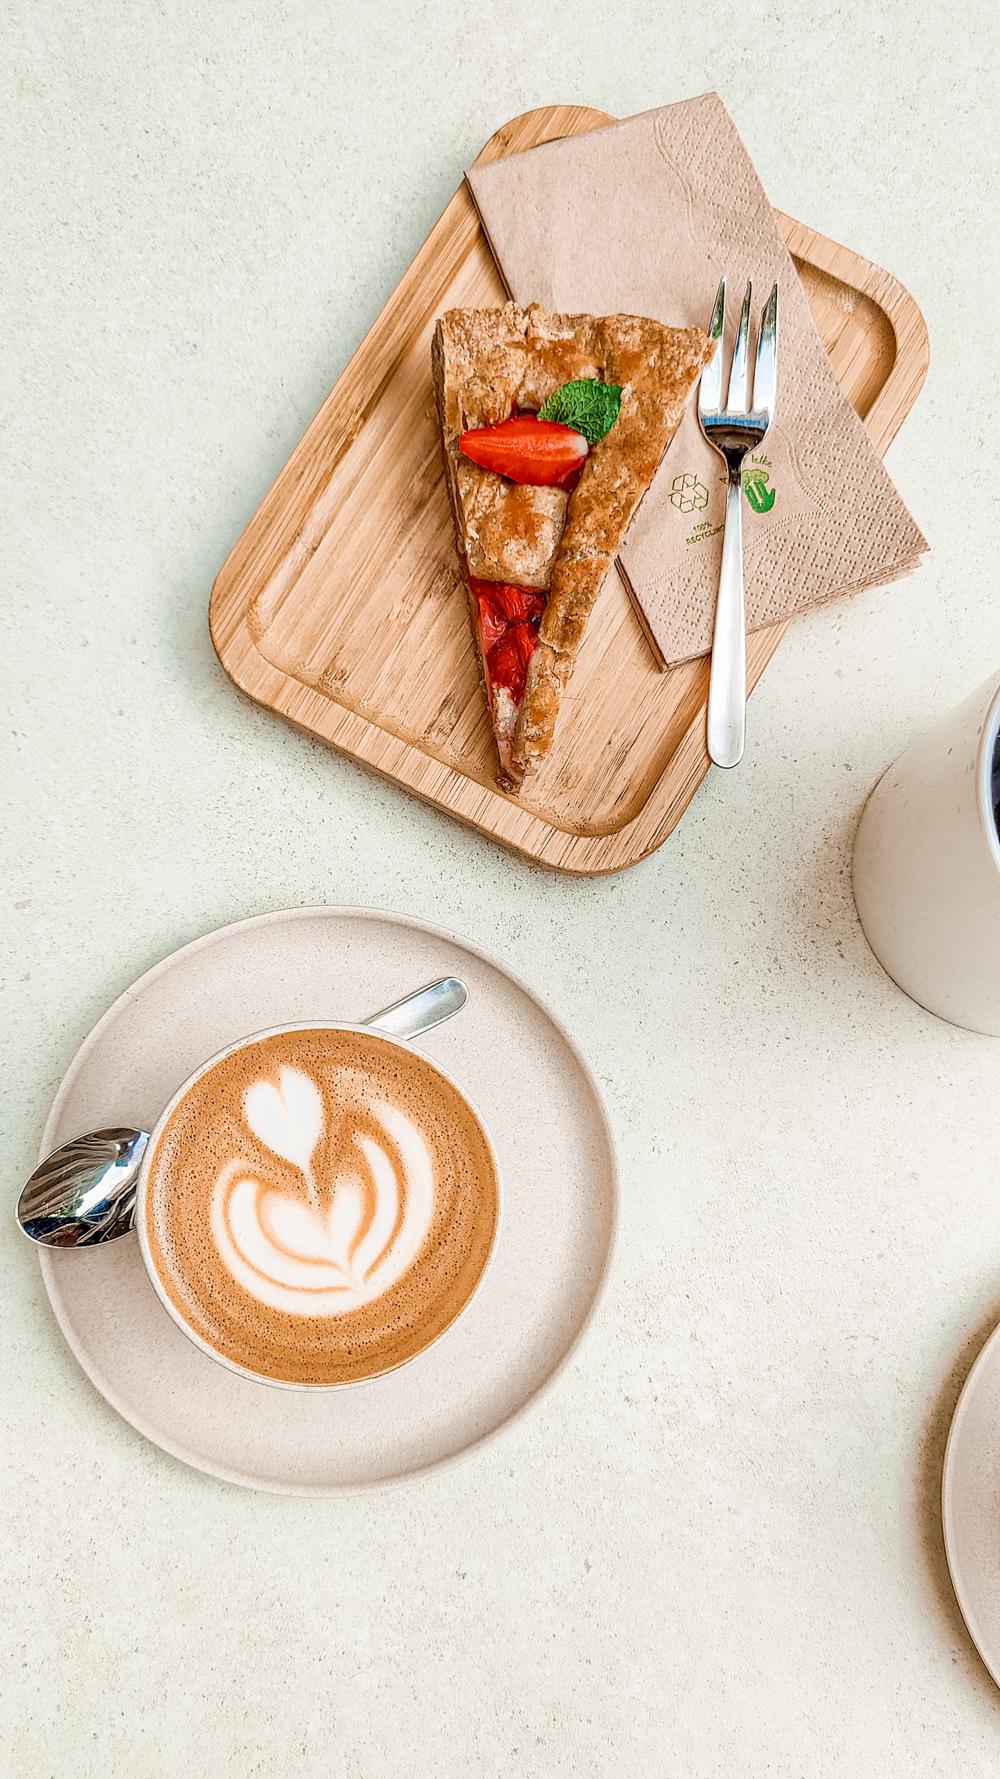 Flat white at Caphe by Hai Nam - 10 must-visit stylish specialty coffee shops in Budapest, Hungary   Aliz's Wonderland